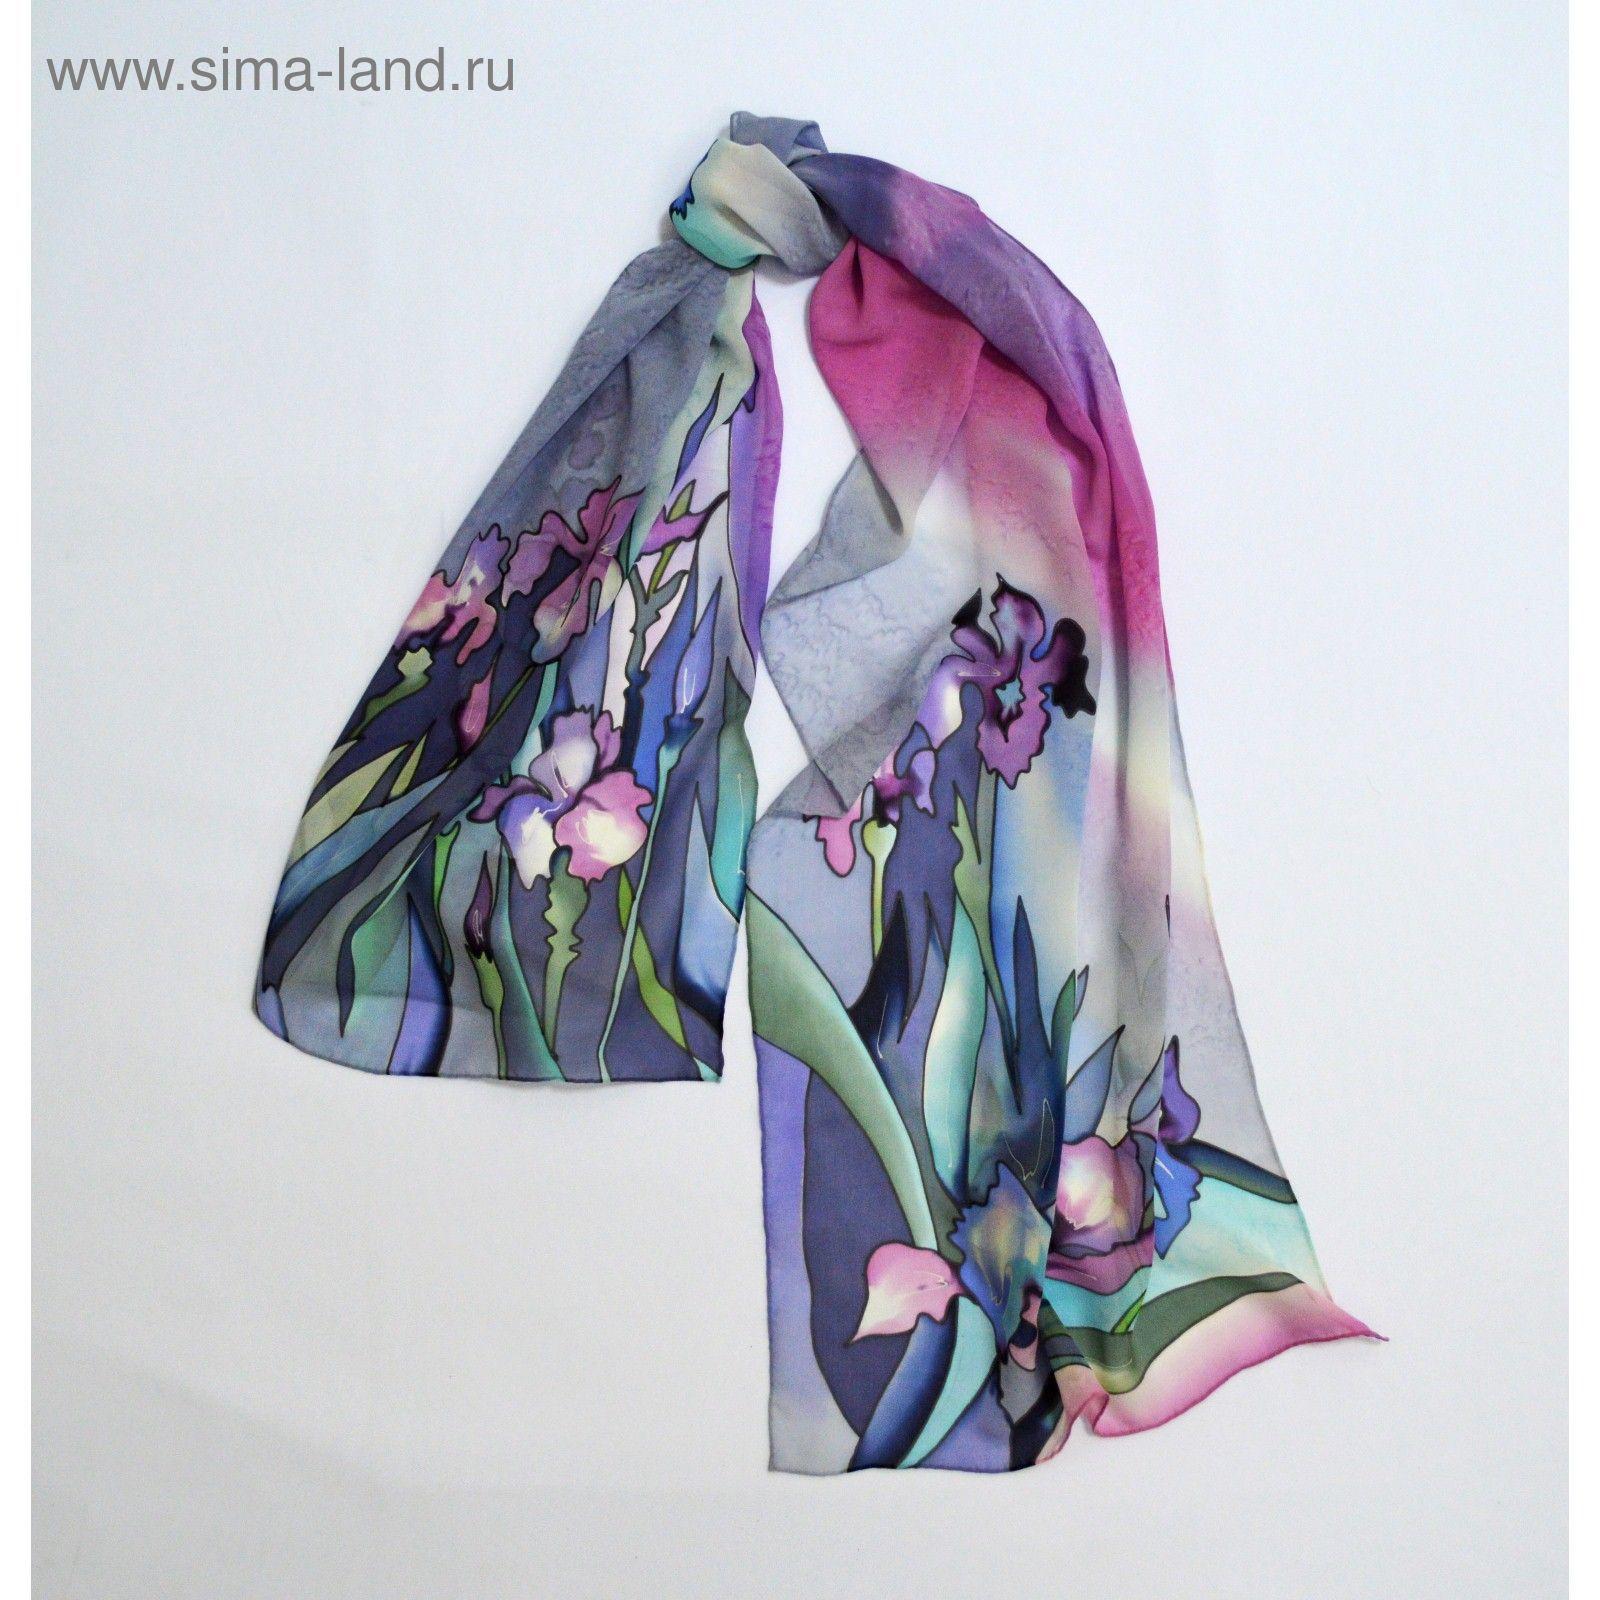 Шарф ручная роспись Ирисы (розово-фиолетовый), 45х175 см, шифон 100% шёлк 60207b306bc